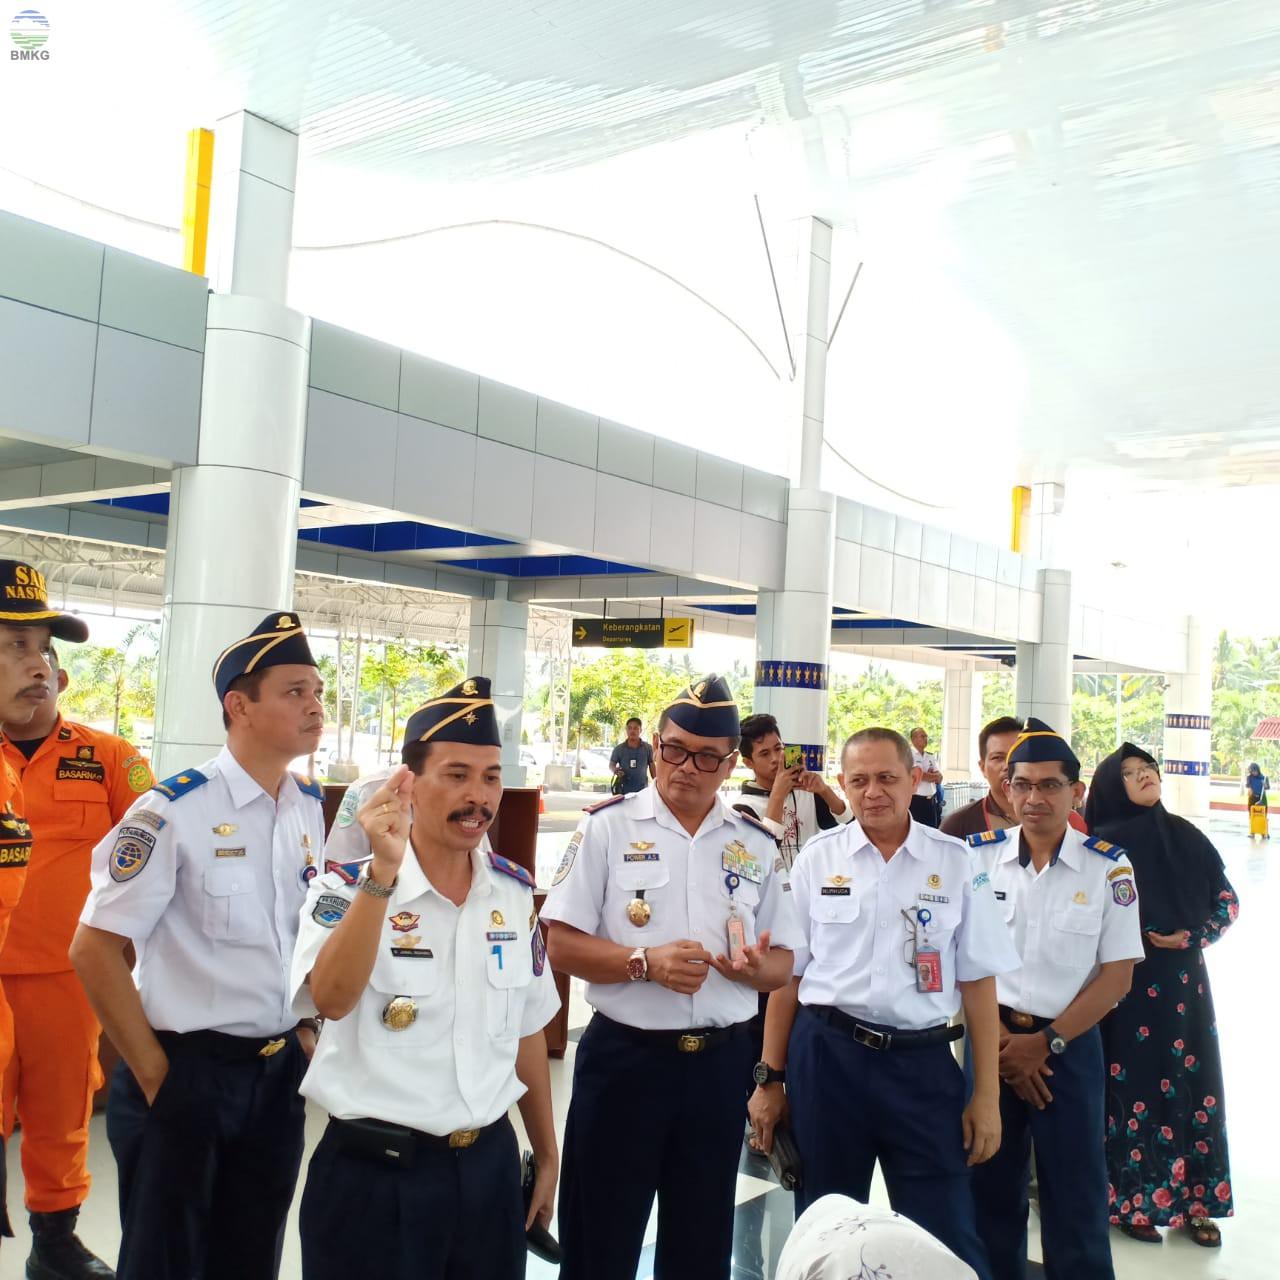 Kontribusi Aktif Stasiun Meteorologi Kelas I Djalaluddin Gorontalo dalam Posko Angkutan Udara Lebaran Tahun 2019/1440 H